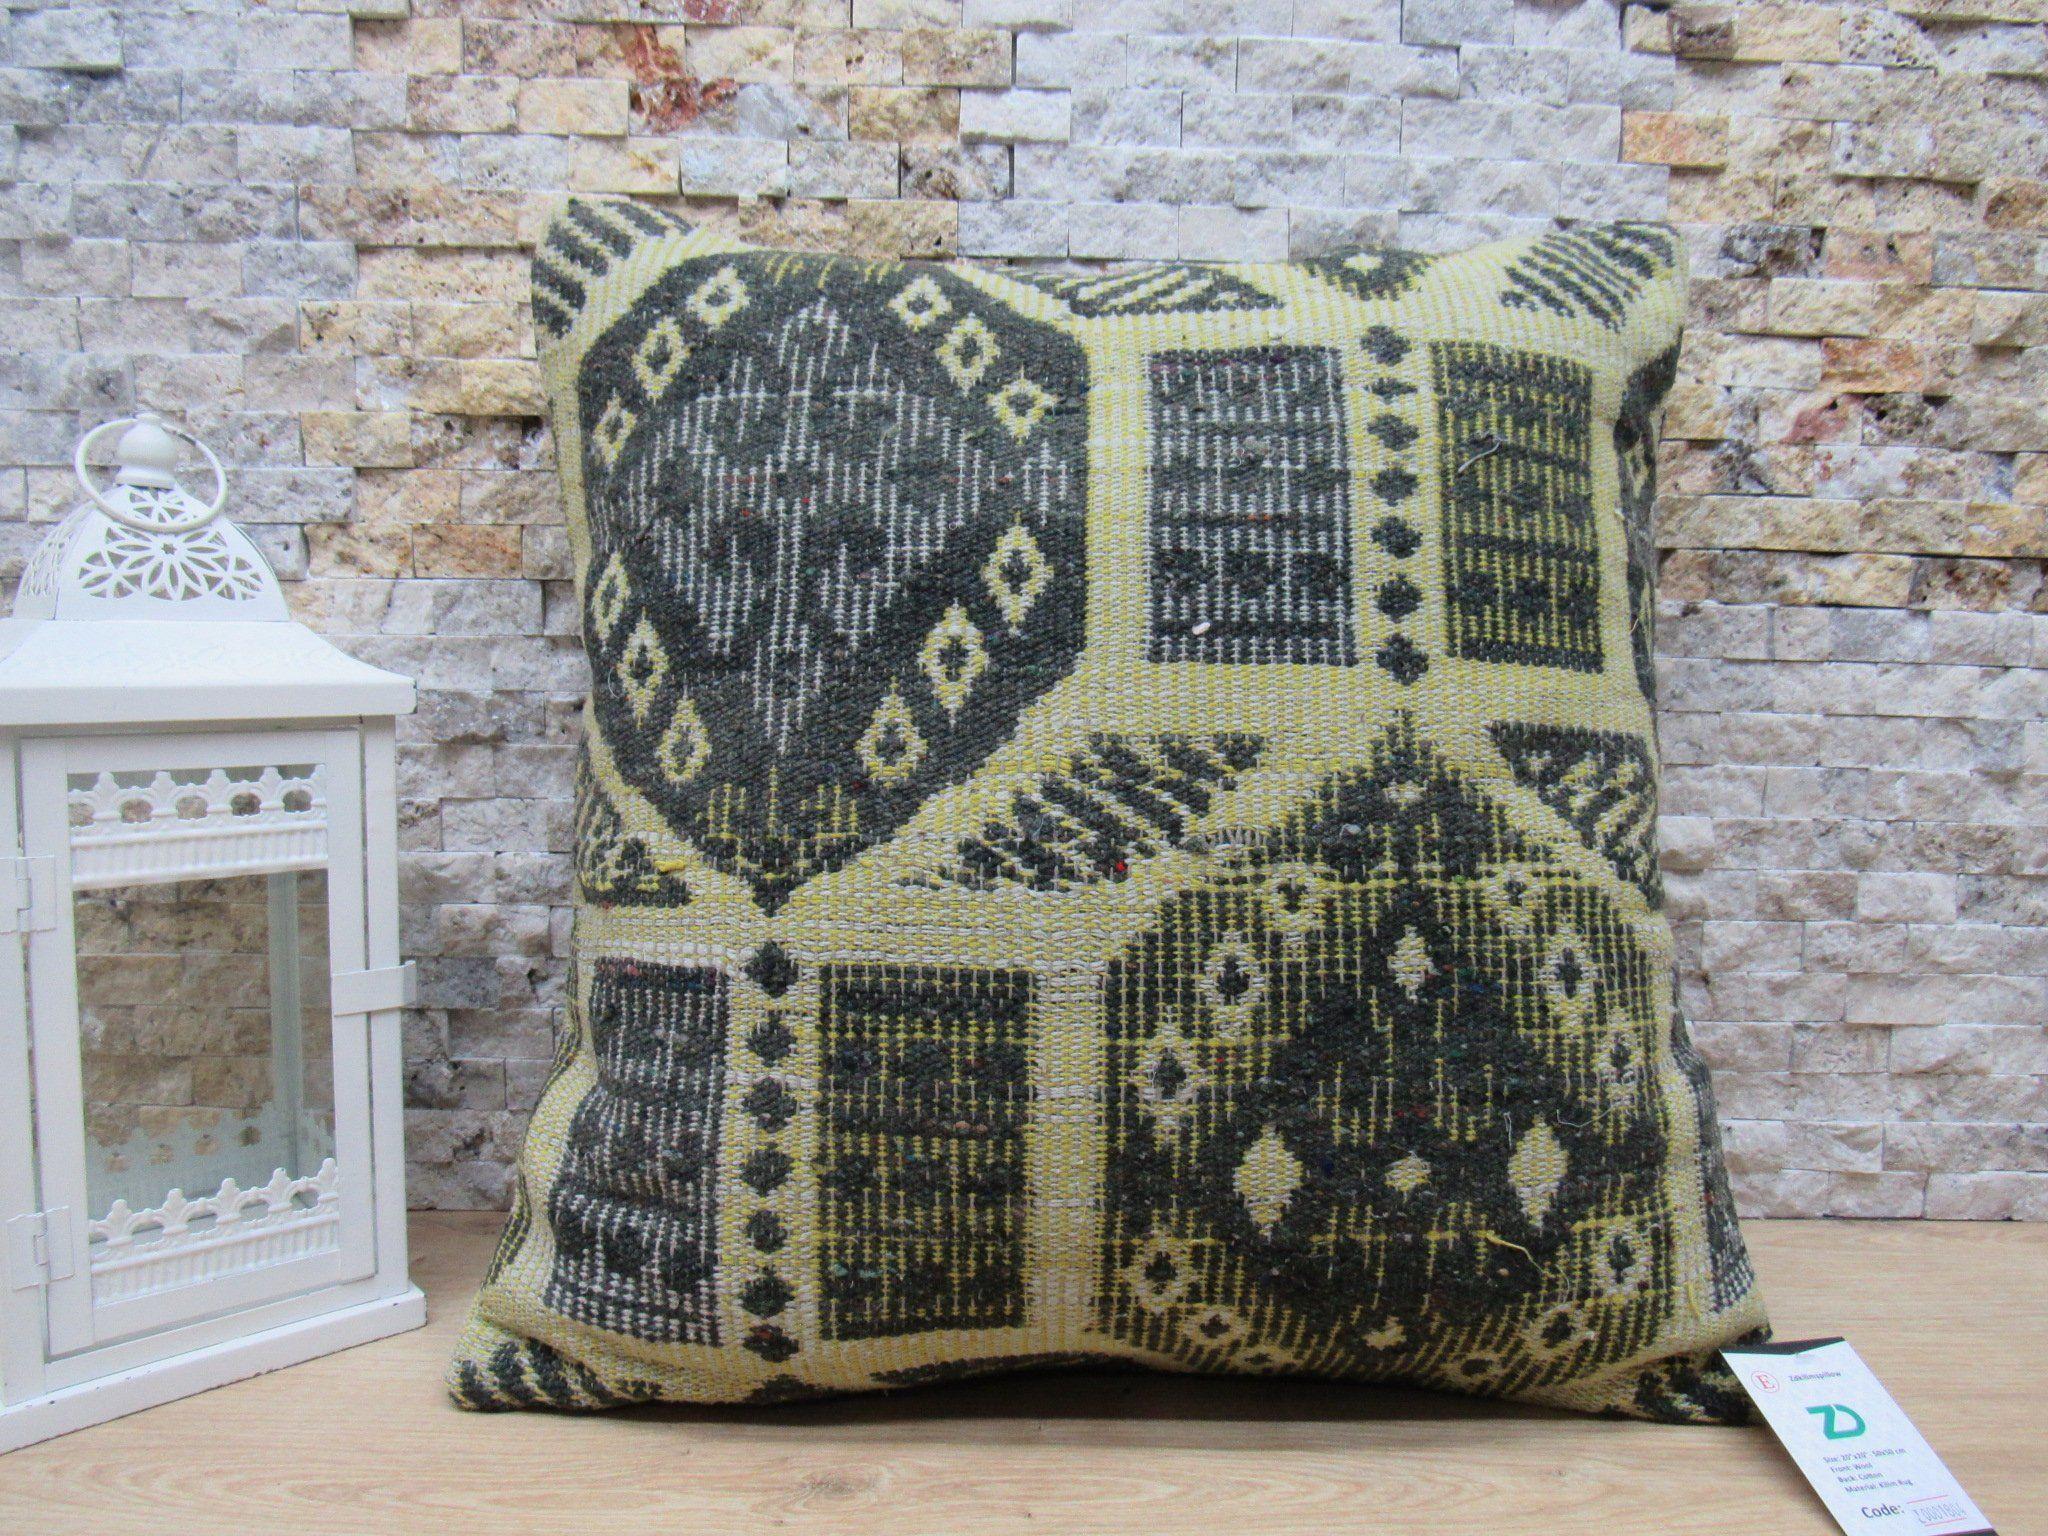 Patterned Kilim Pillow Home Decor Pillow 20x20 Decorative Kilim